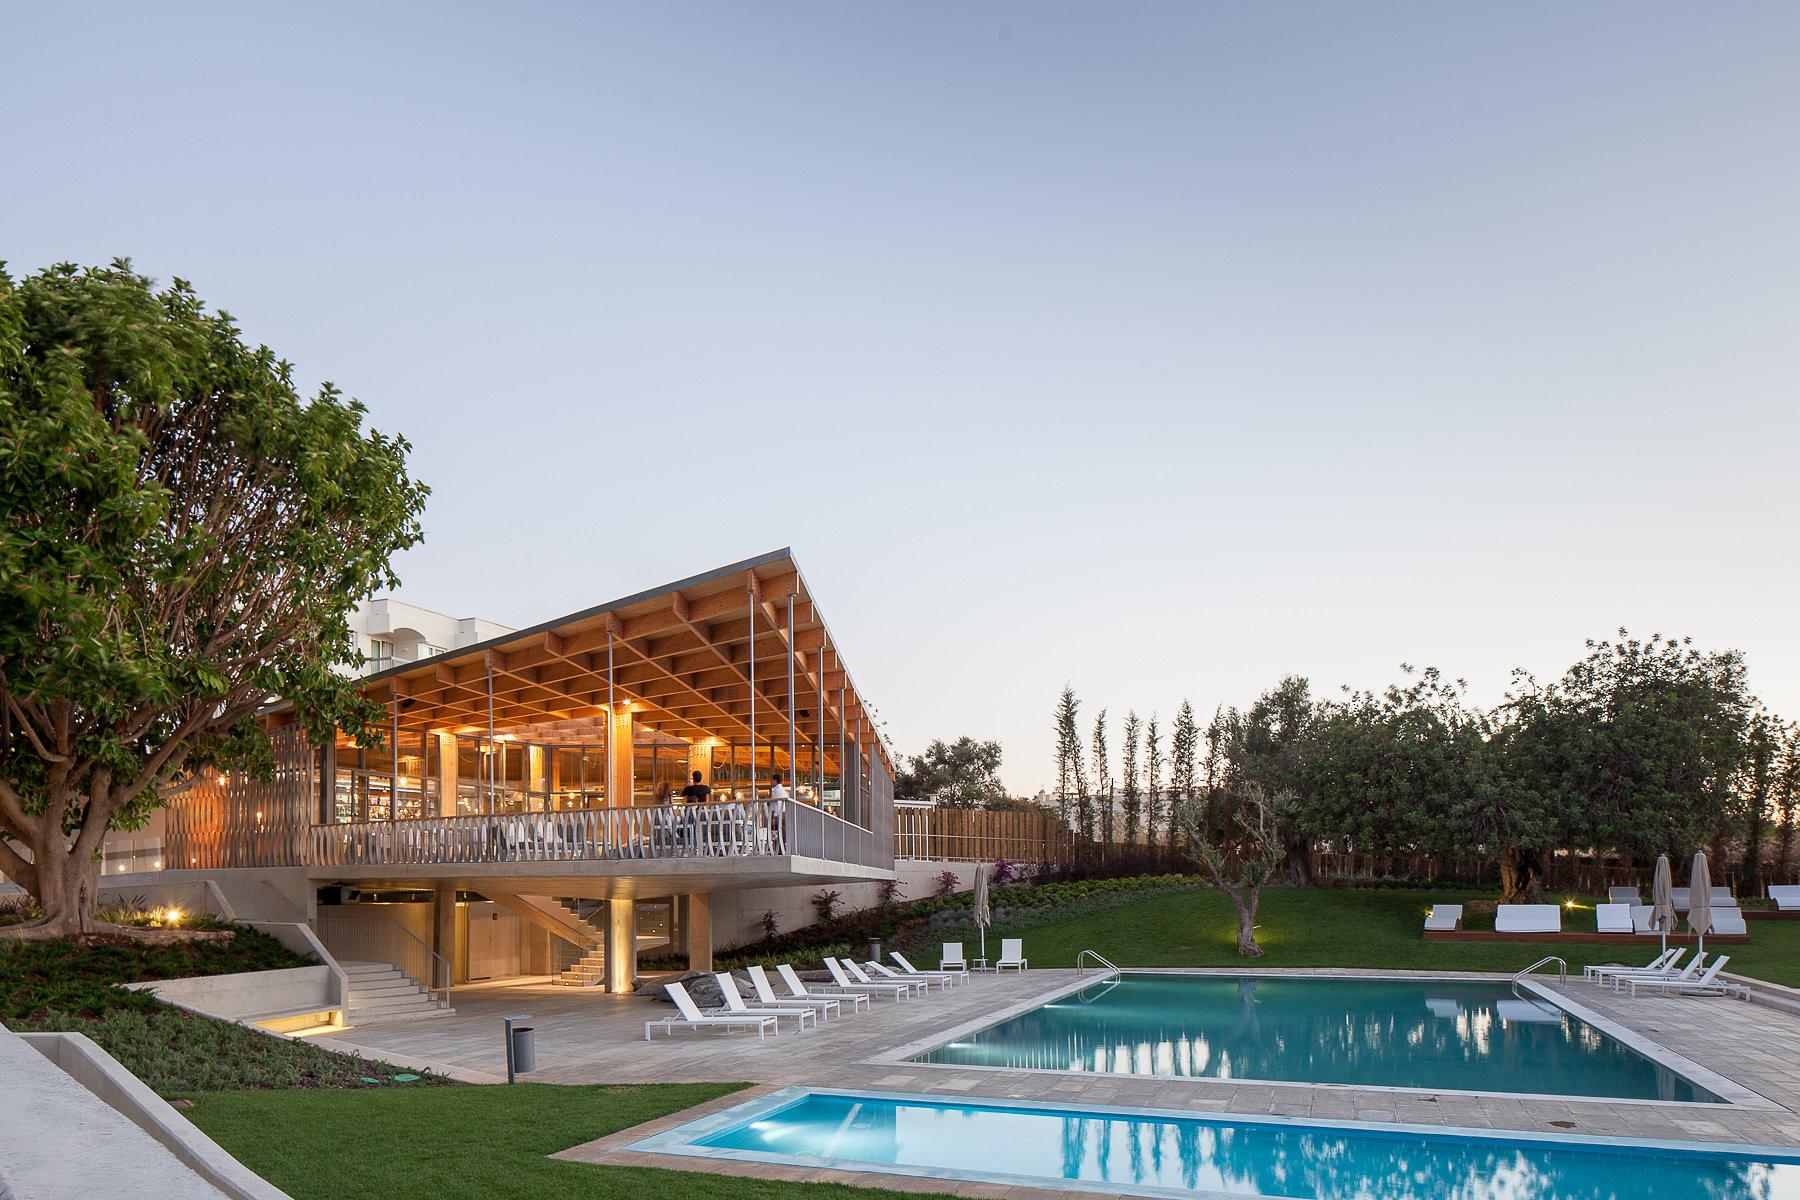 fad 2015 architect.bjc.es